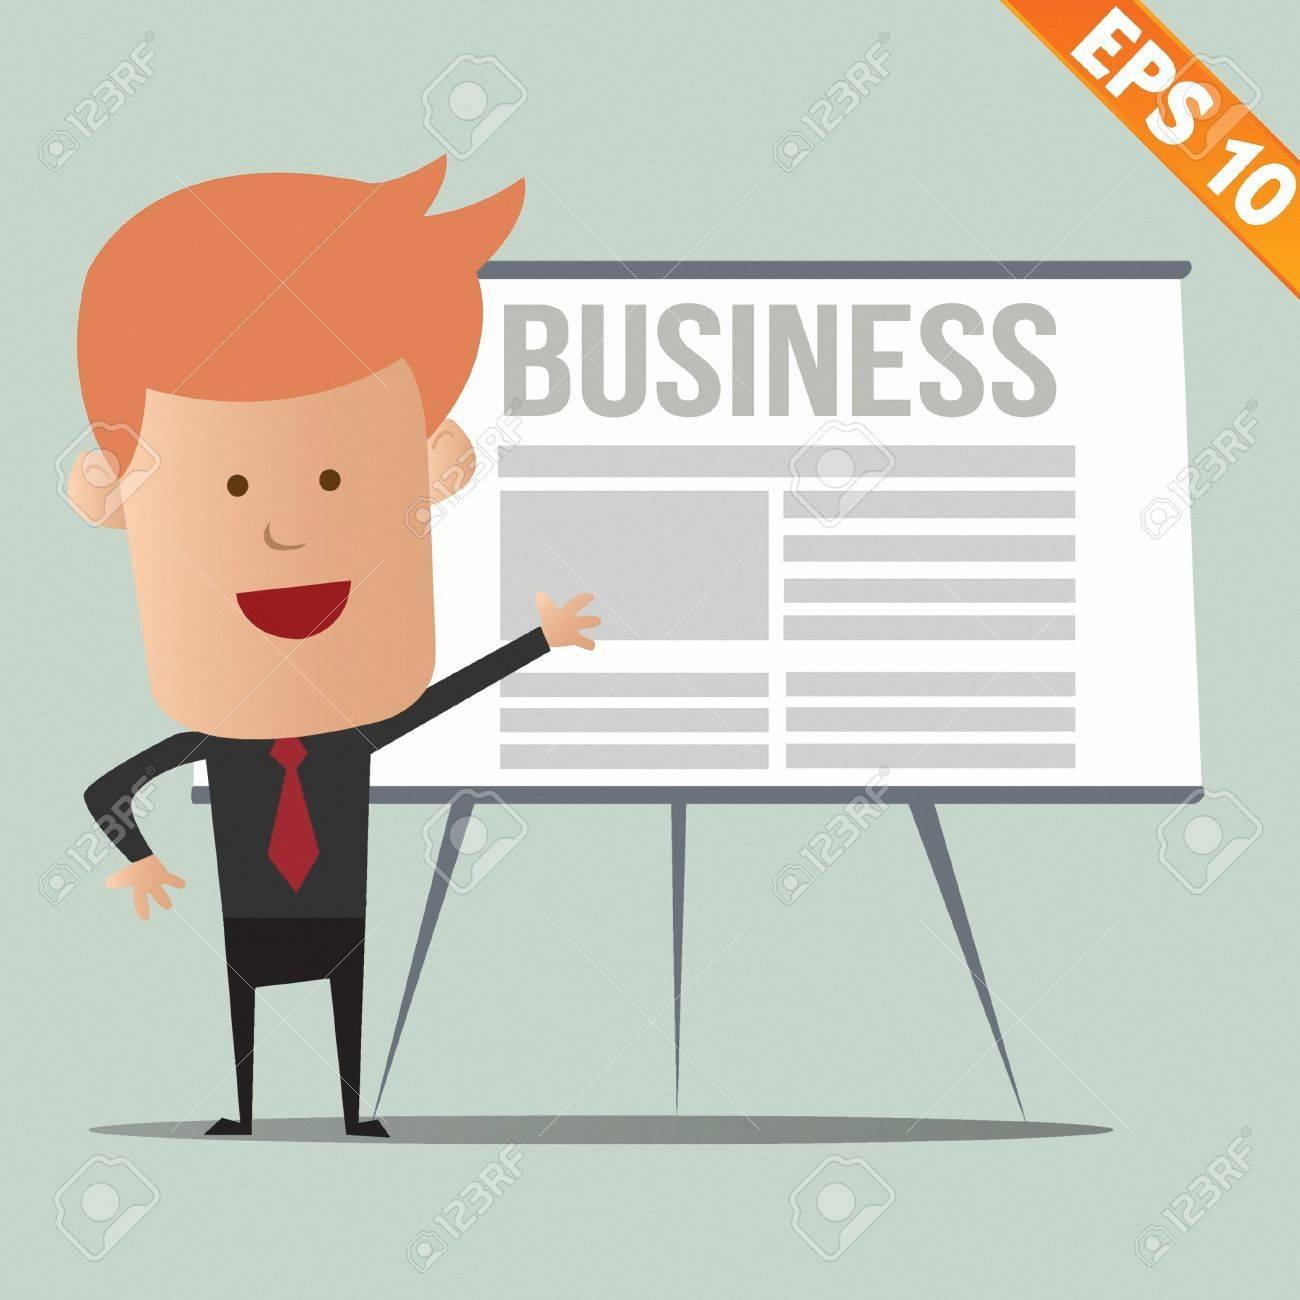 Business team cartoon characters cartoon vector cartoondealer com - Cartoon Business Man Cartoon Business Man Present Information Vector Illustration Eps10